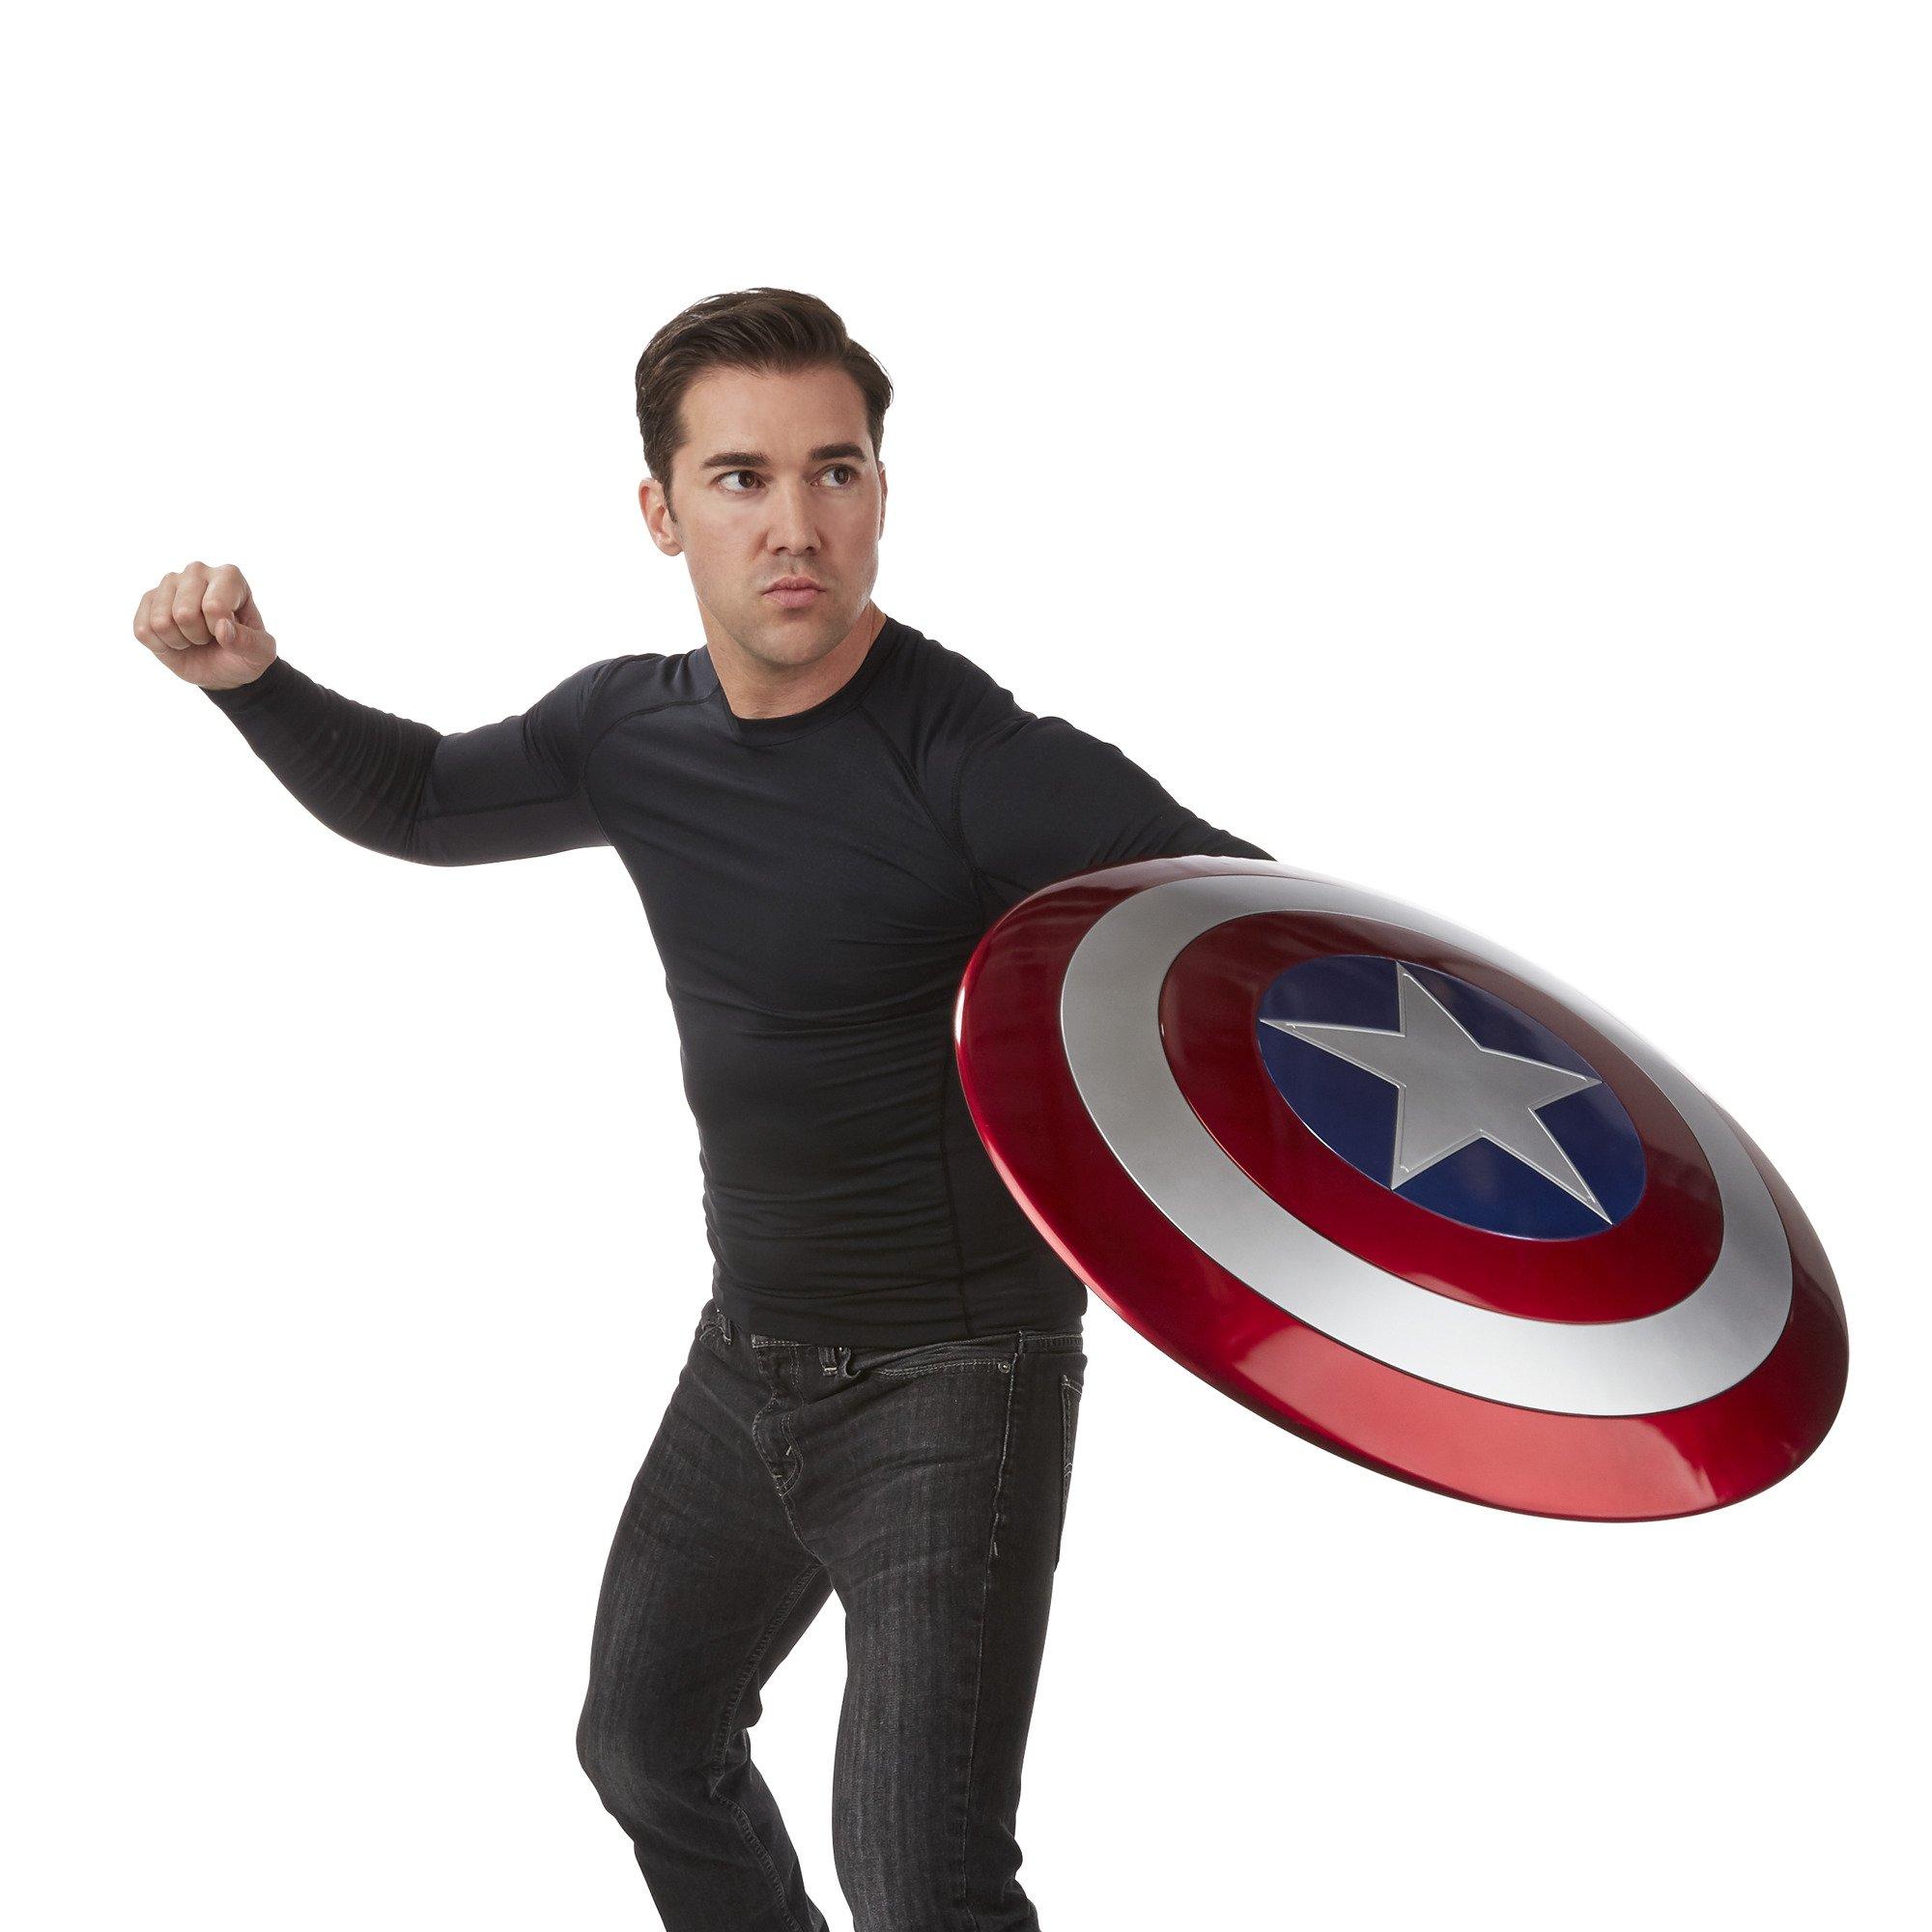 Marvel Legends Captain America Shield by Avengers (Image #10)